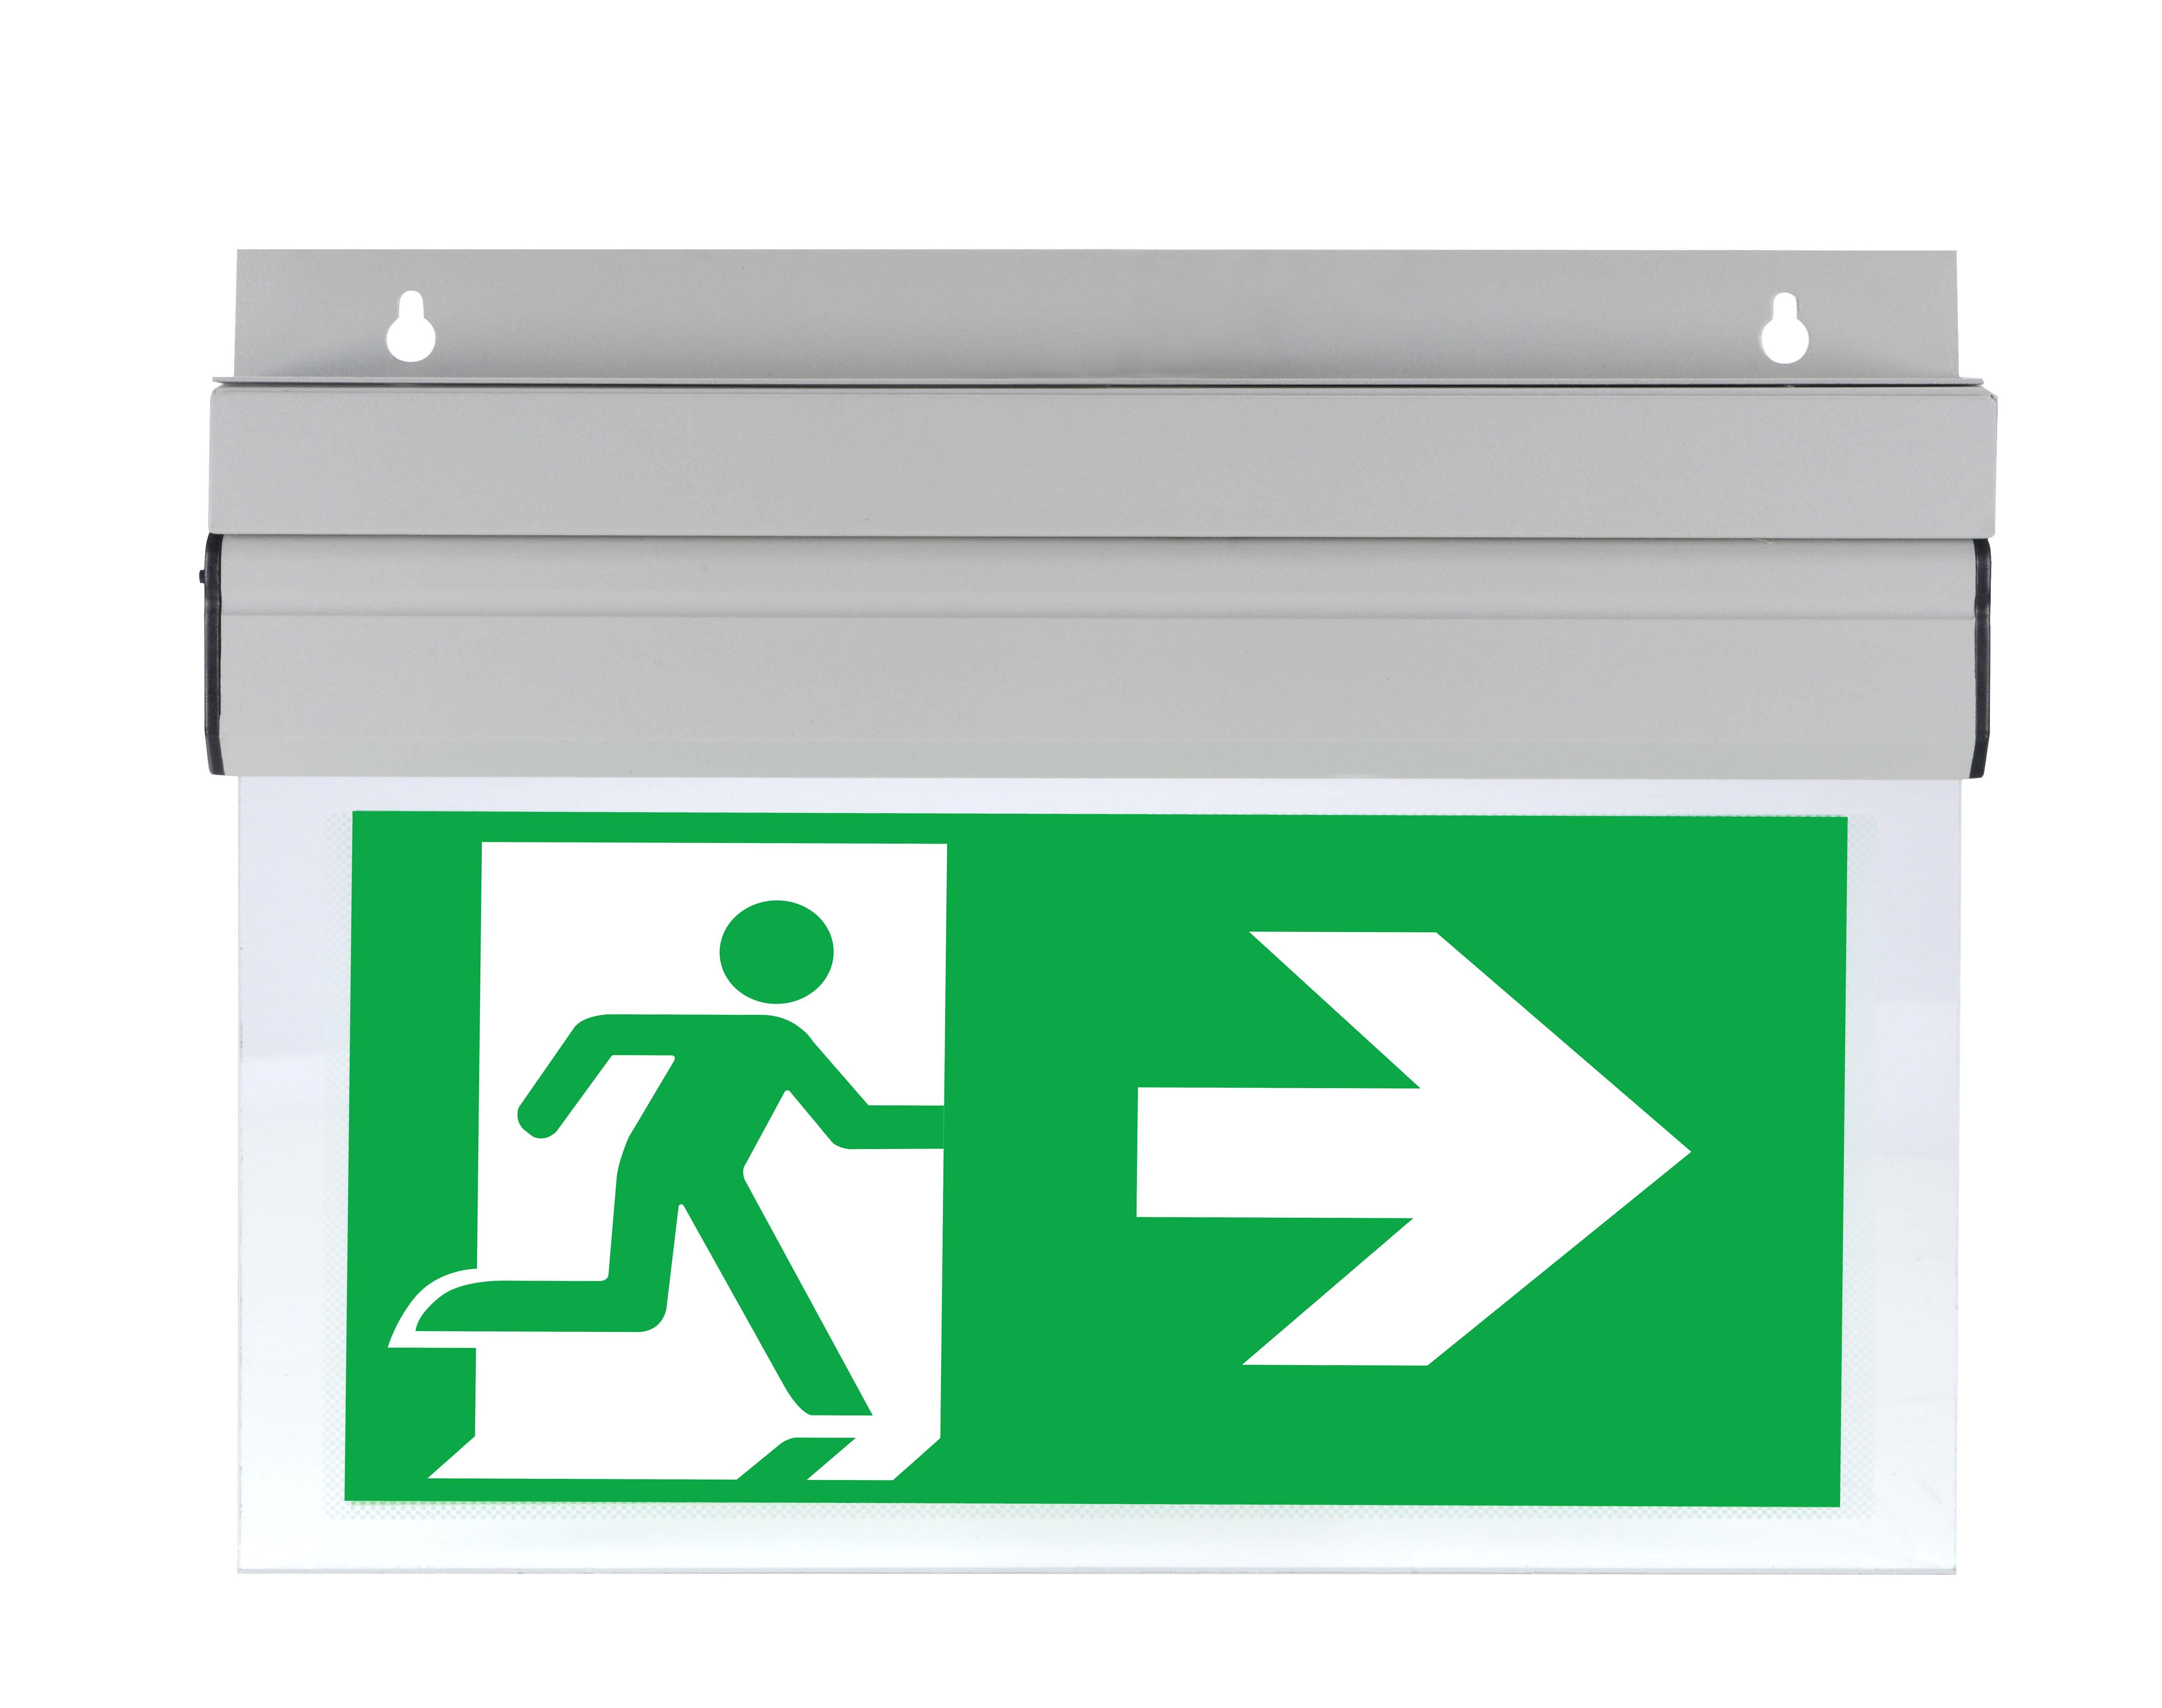 Lampa evacuare led Intelight 96329   3h mentinut/nementinut test automat 6